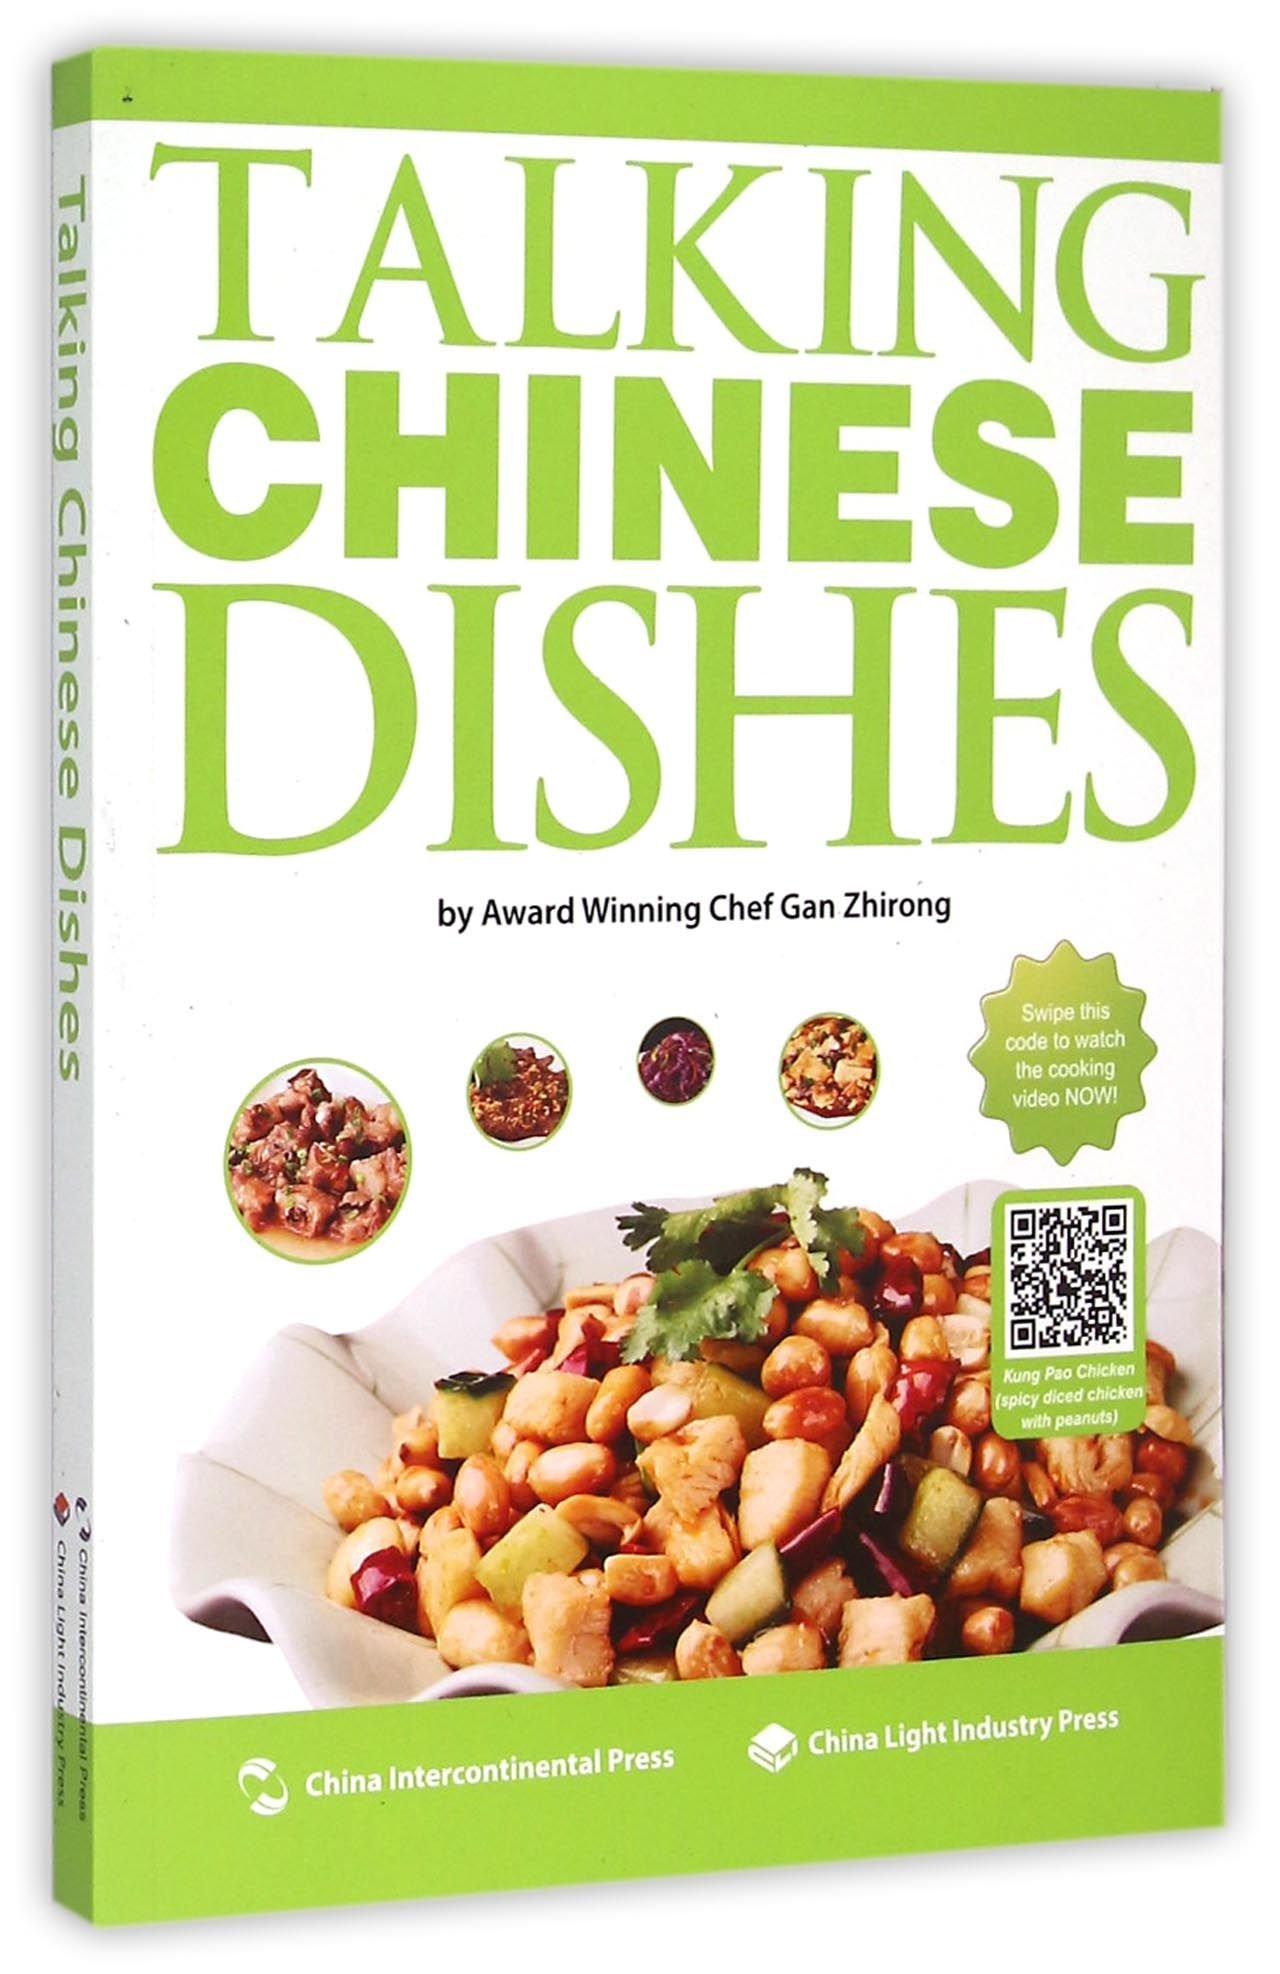 Talking chinese dishes gan zhirong yan ke 9787508530901 amazon talking chinese dishes gan zhirong yan ke 9787508530901 amazon books forumfinder Image collections